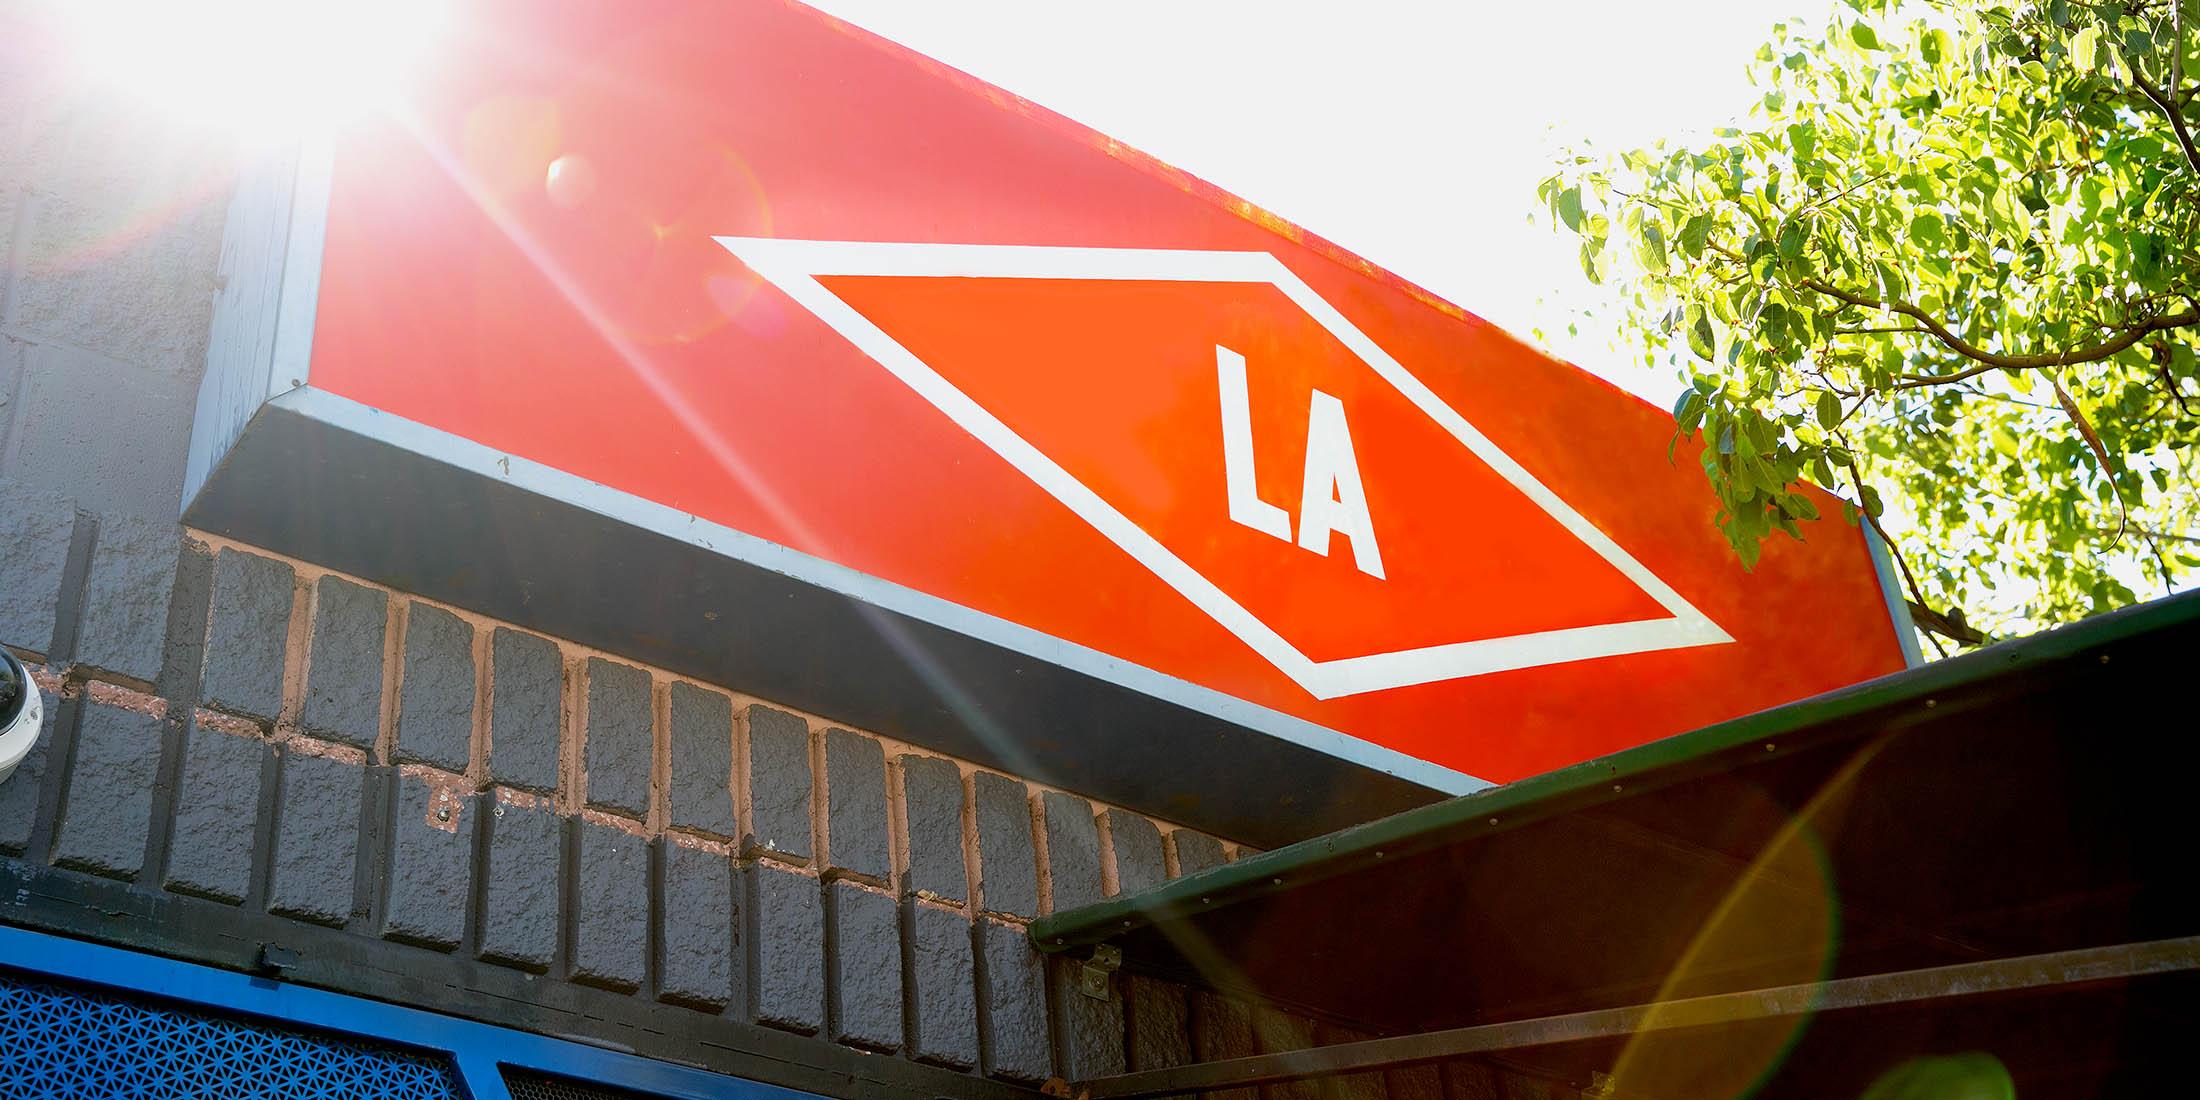 LA Sign at Squirl Cafe